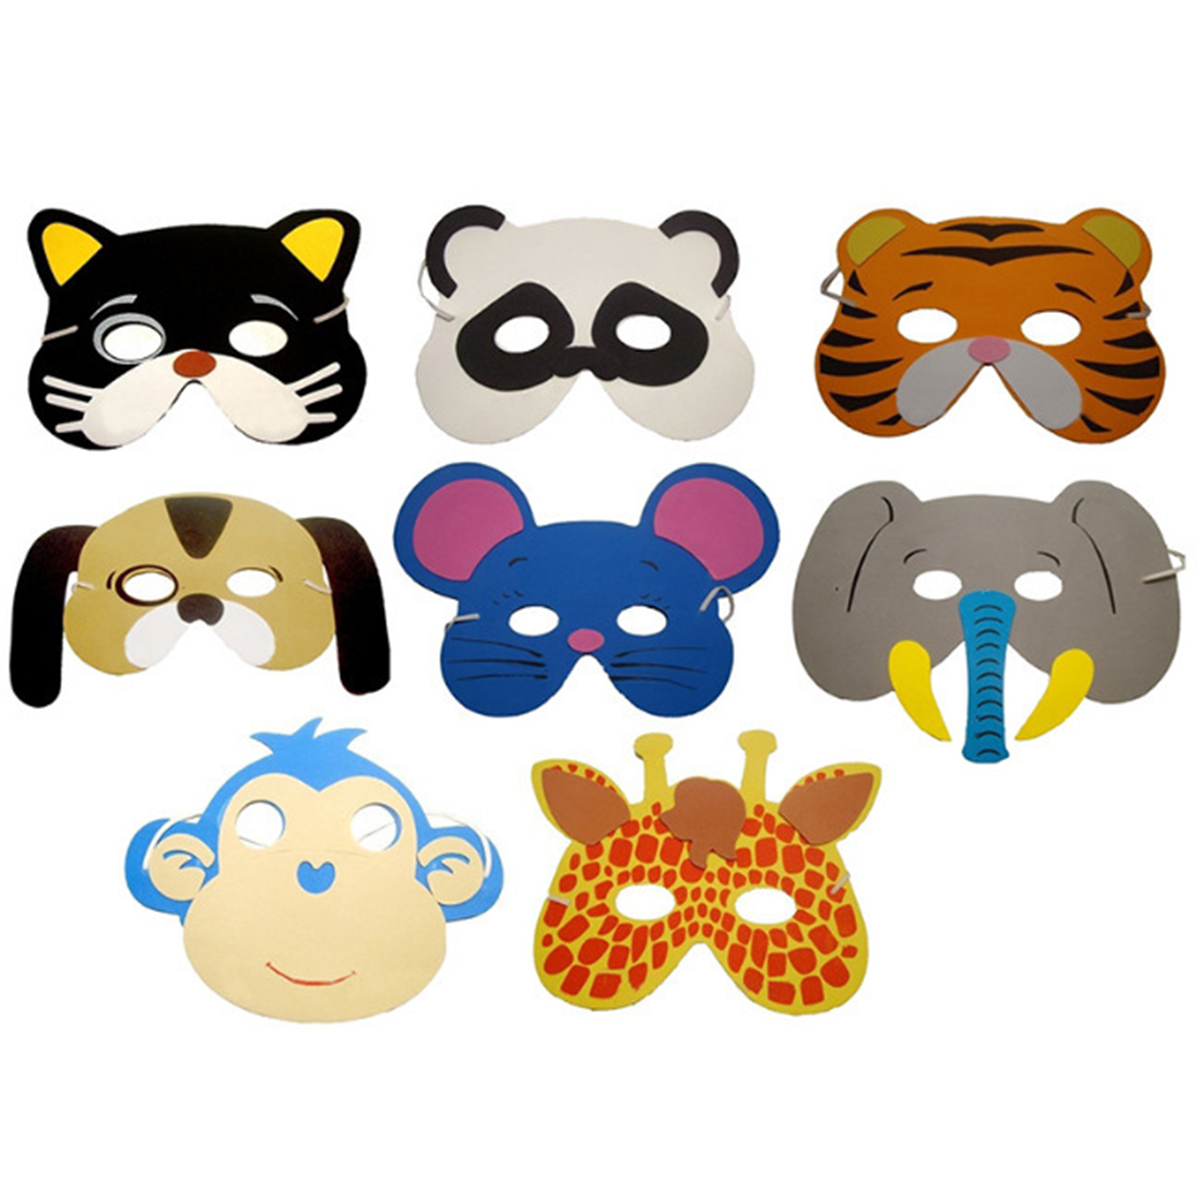 12pcs EVA Foam Animal Masks Mask Birthday Party Supplies Cartoon Kids Party Dress Up Costume Zoo Jungle Mask Party Decoration